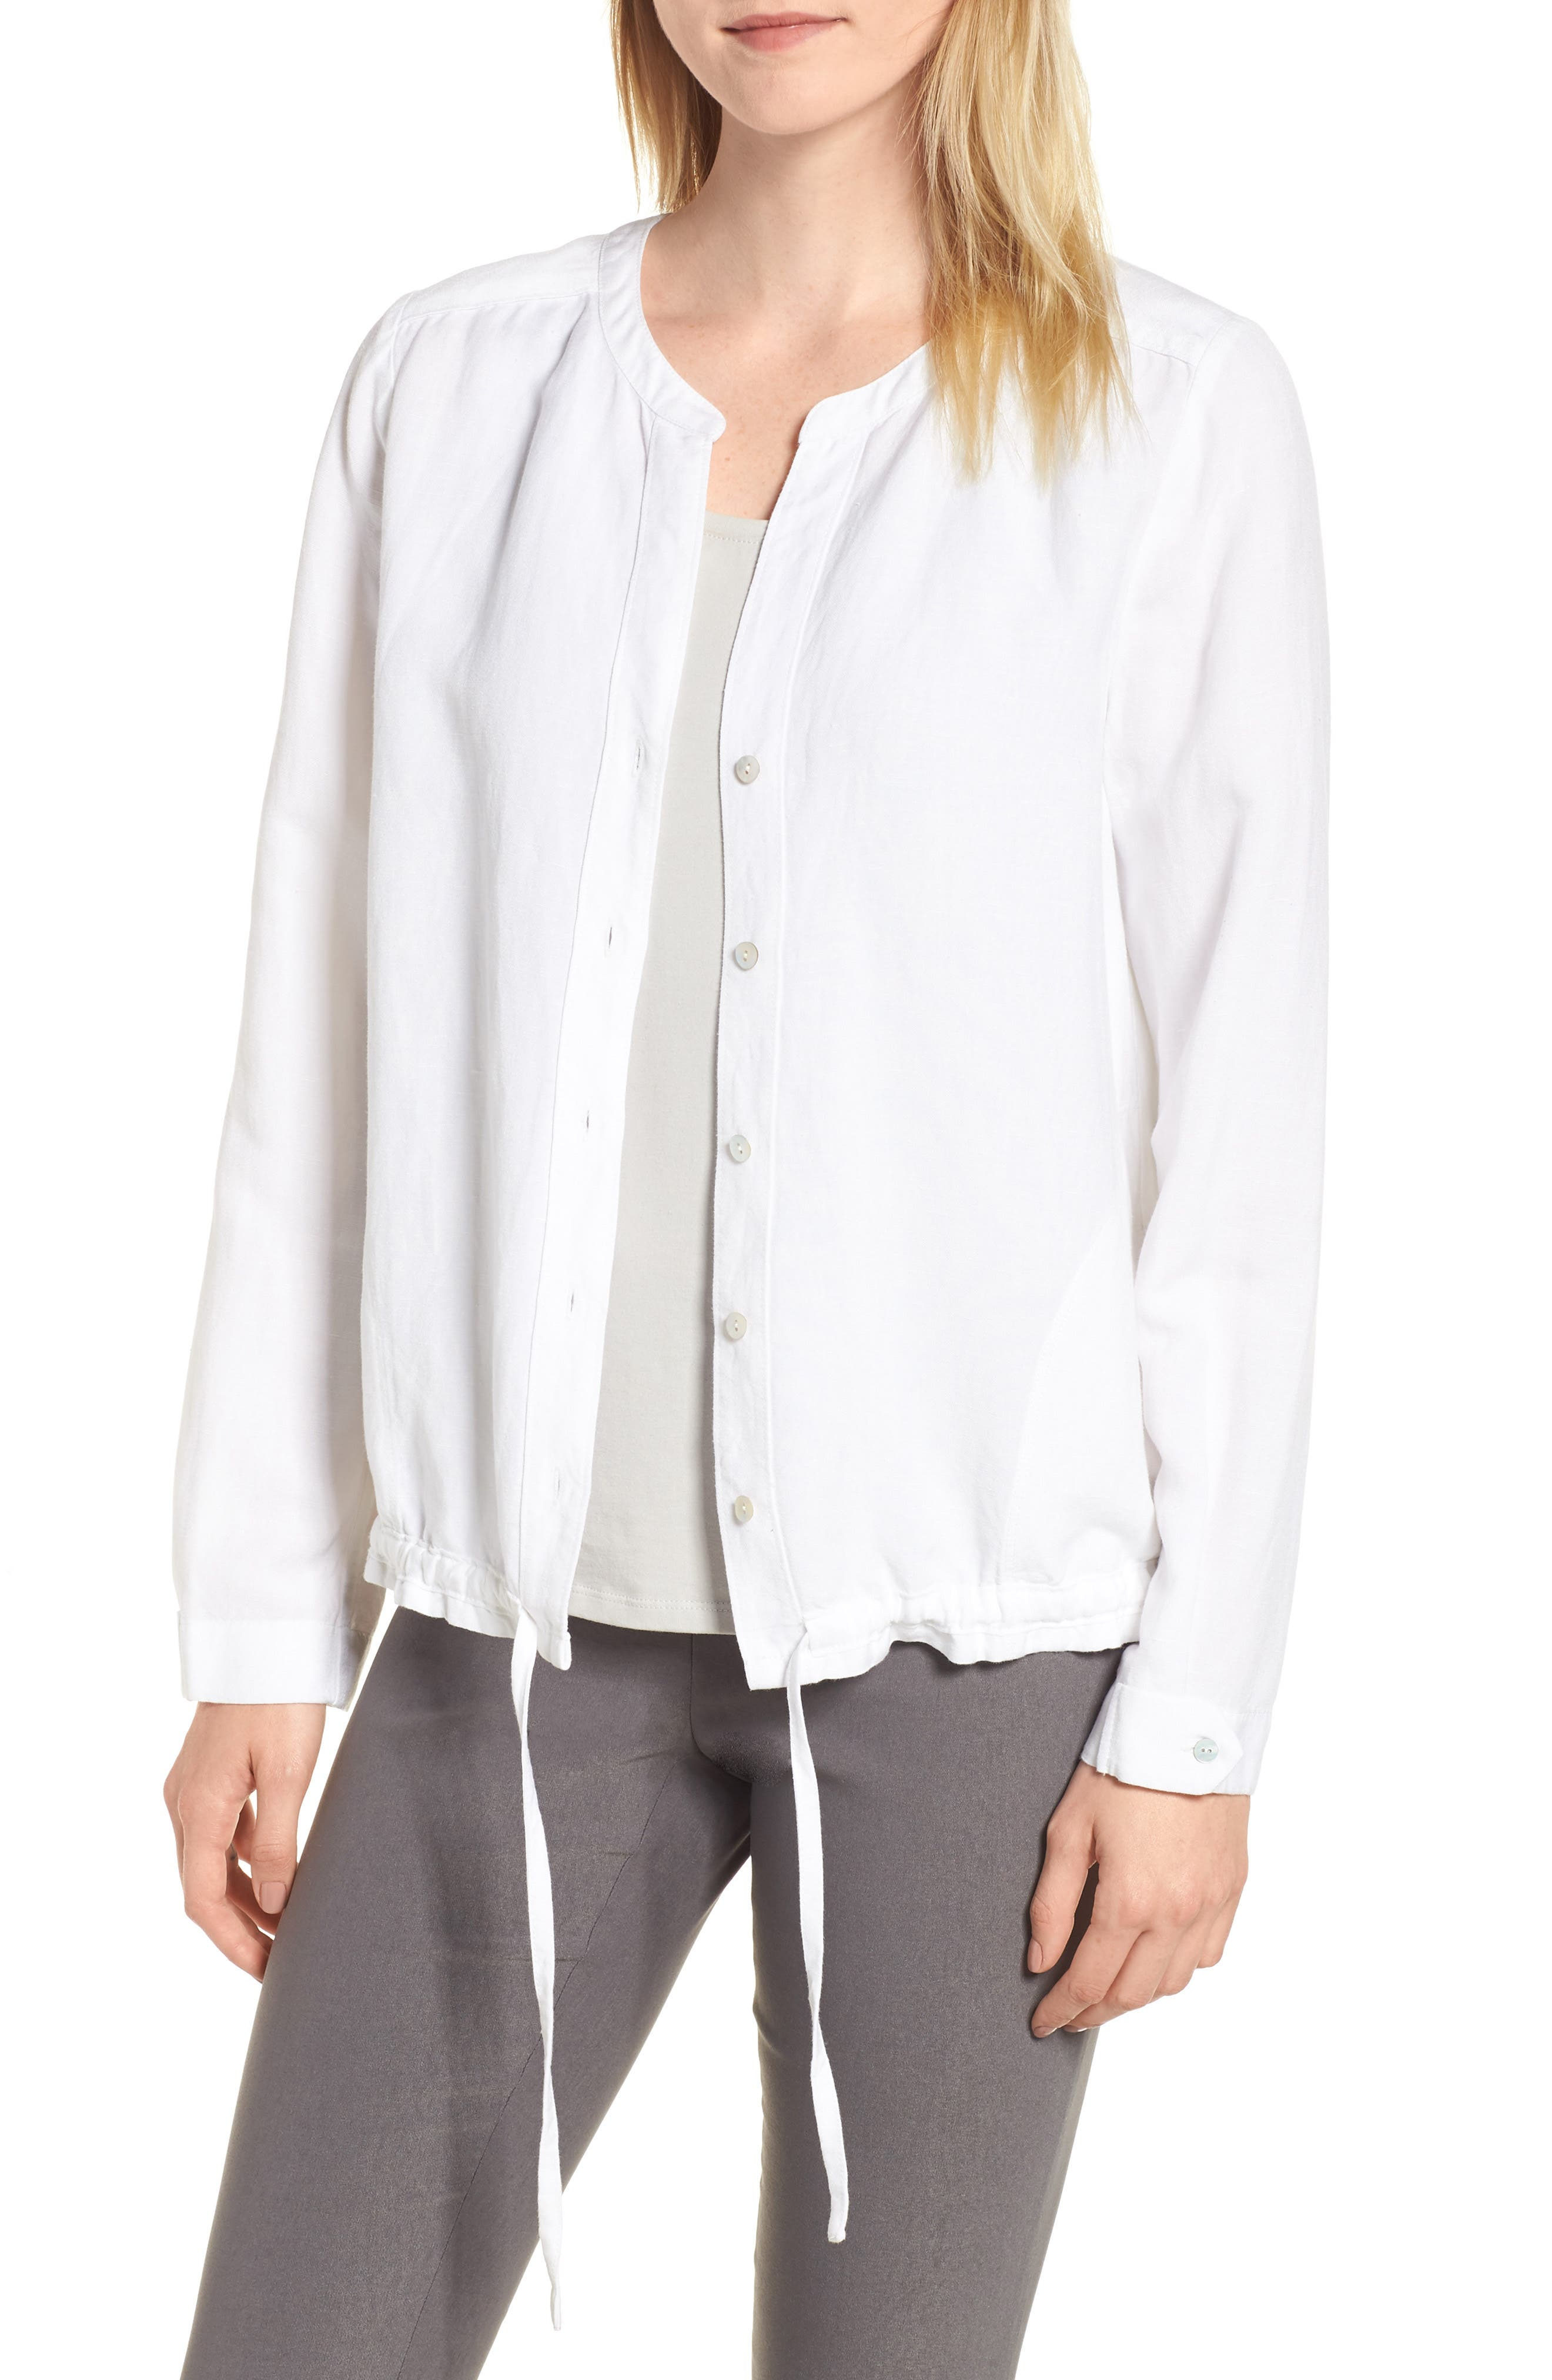 Homebound Linen Blend Drawstring Jacket,                             Main thumbnail 1, color,                             PAPER WHITE